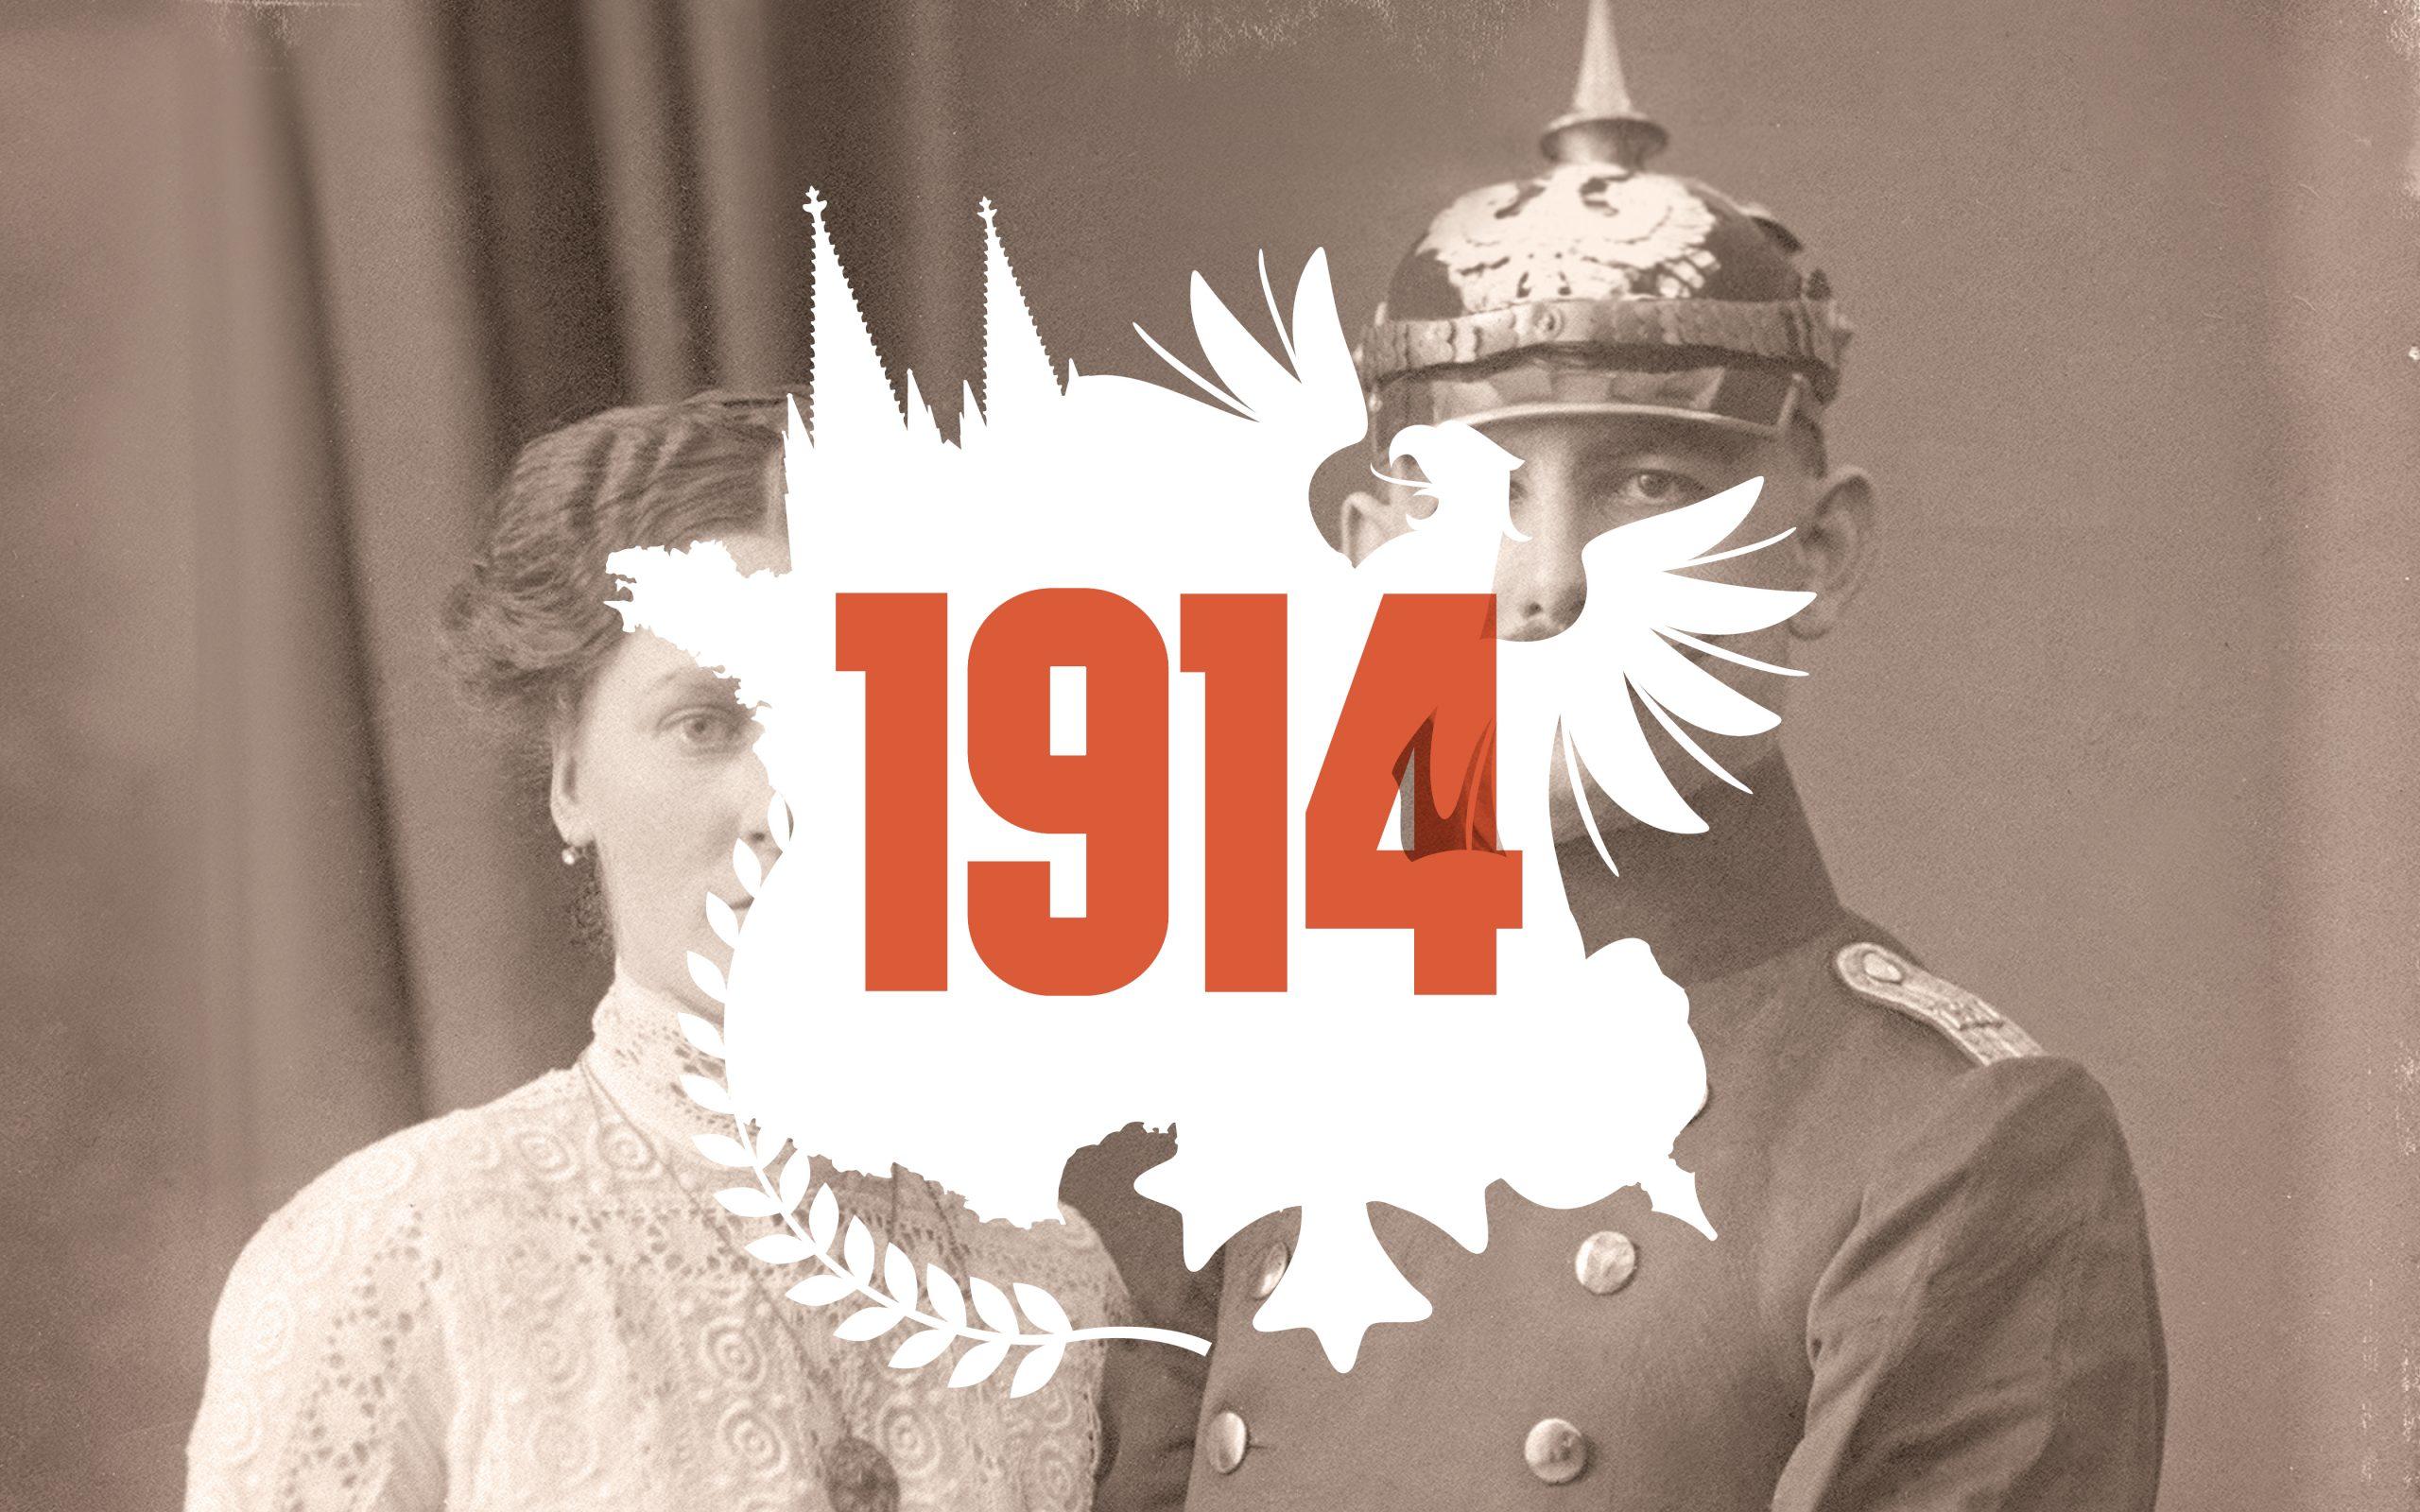 LVR Kulturprojekt 1914: Dachmarken-Konzept, Key Visual